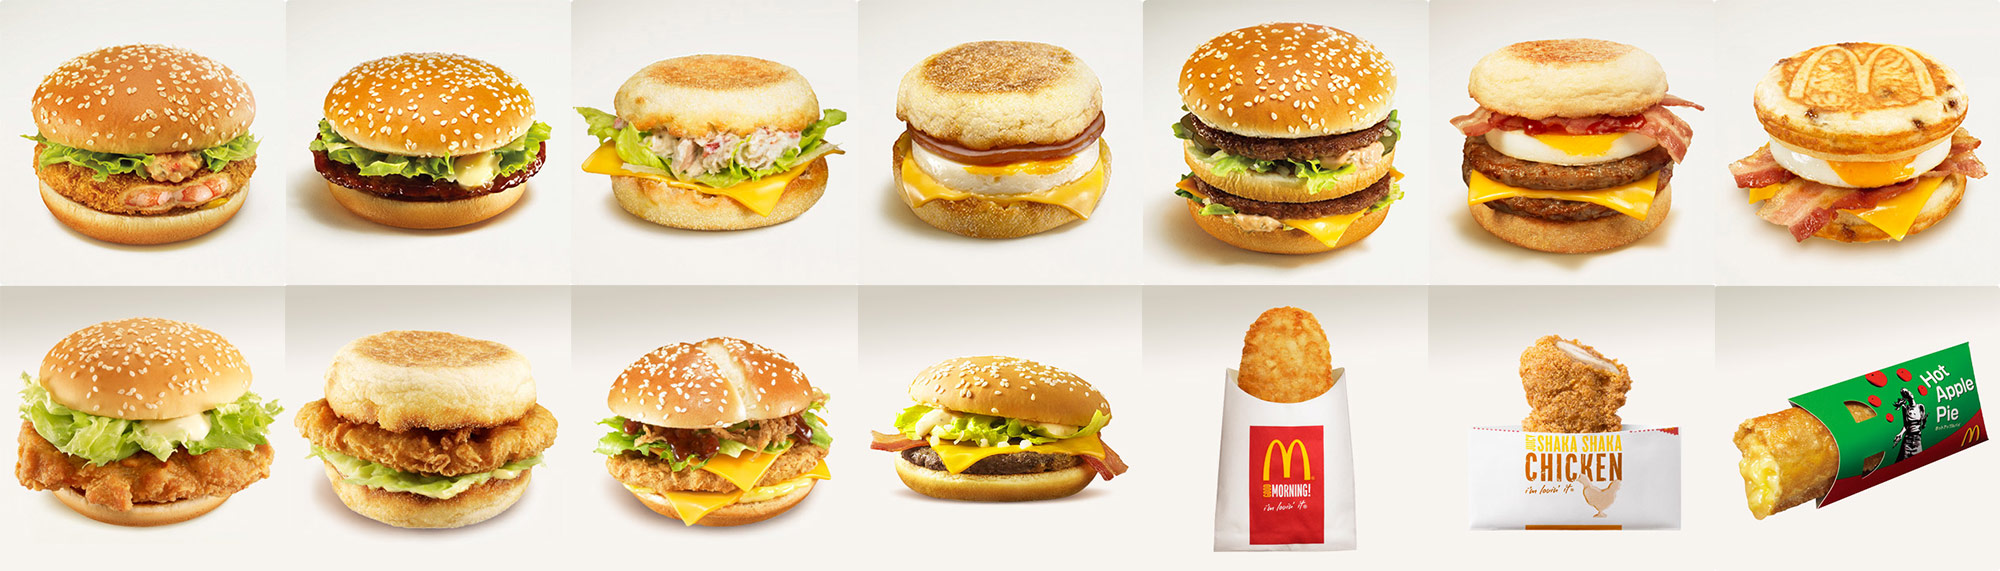 Diffrence De Pirx Fast Food Usa Et France